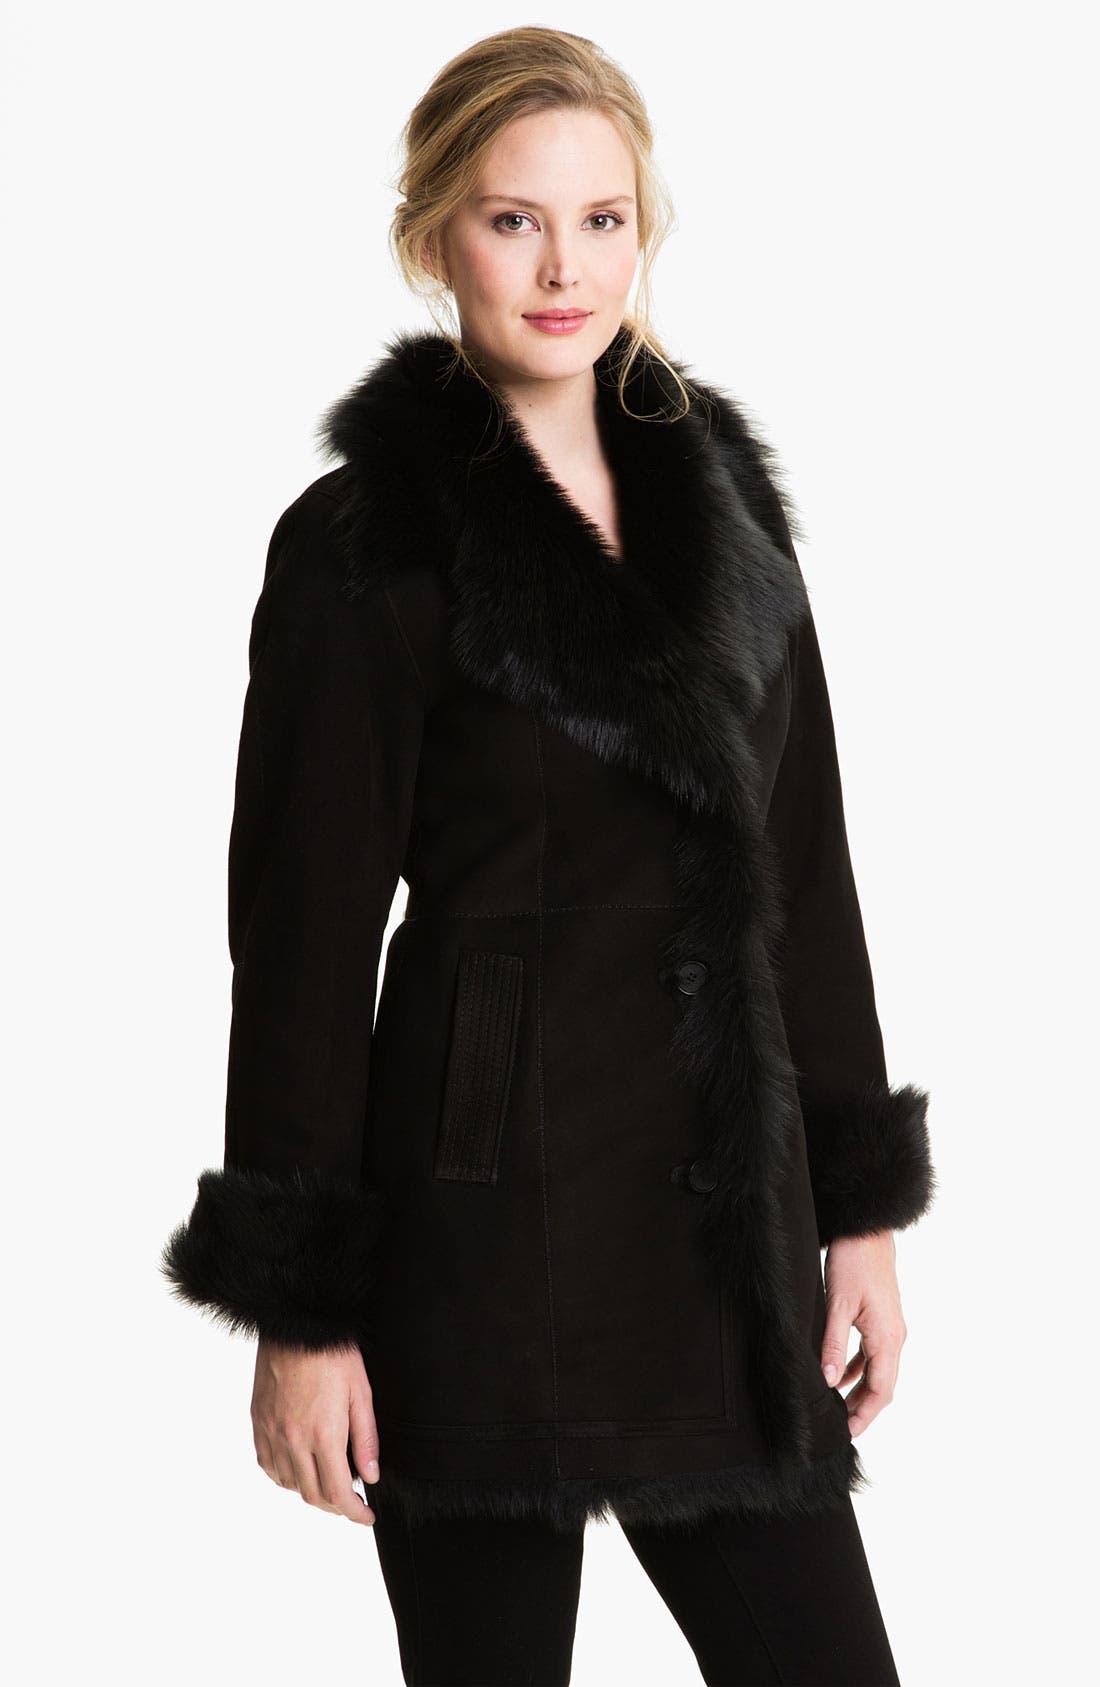 Main Image - HIDESOCIETY Notch Collar Genuine Shearling Coat